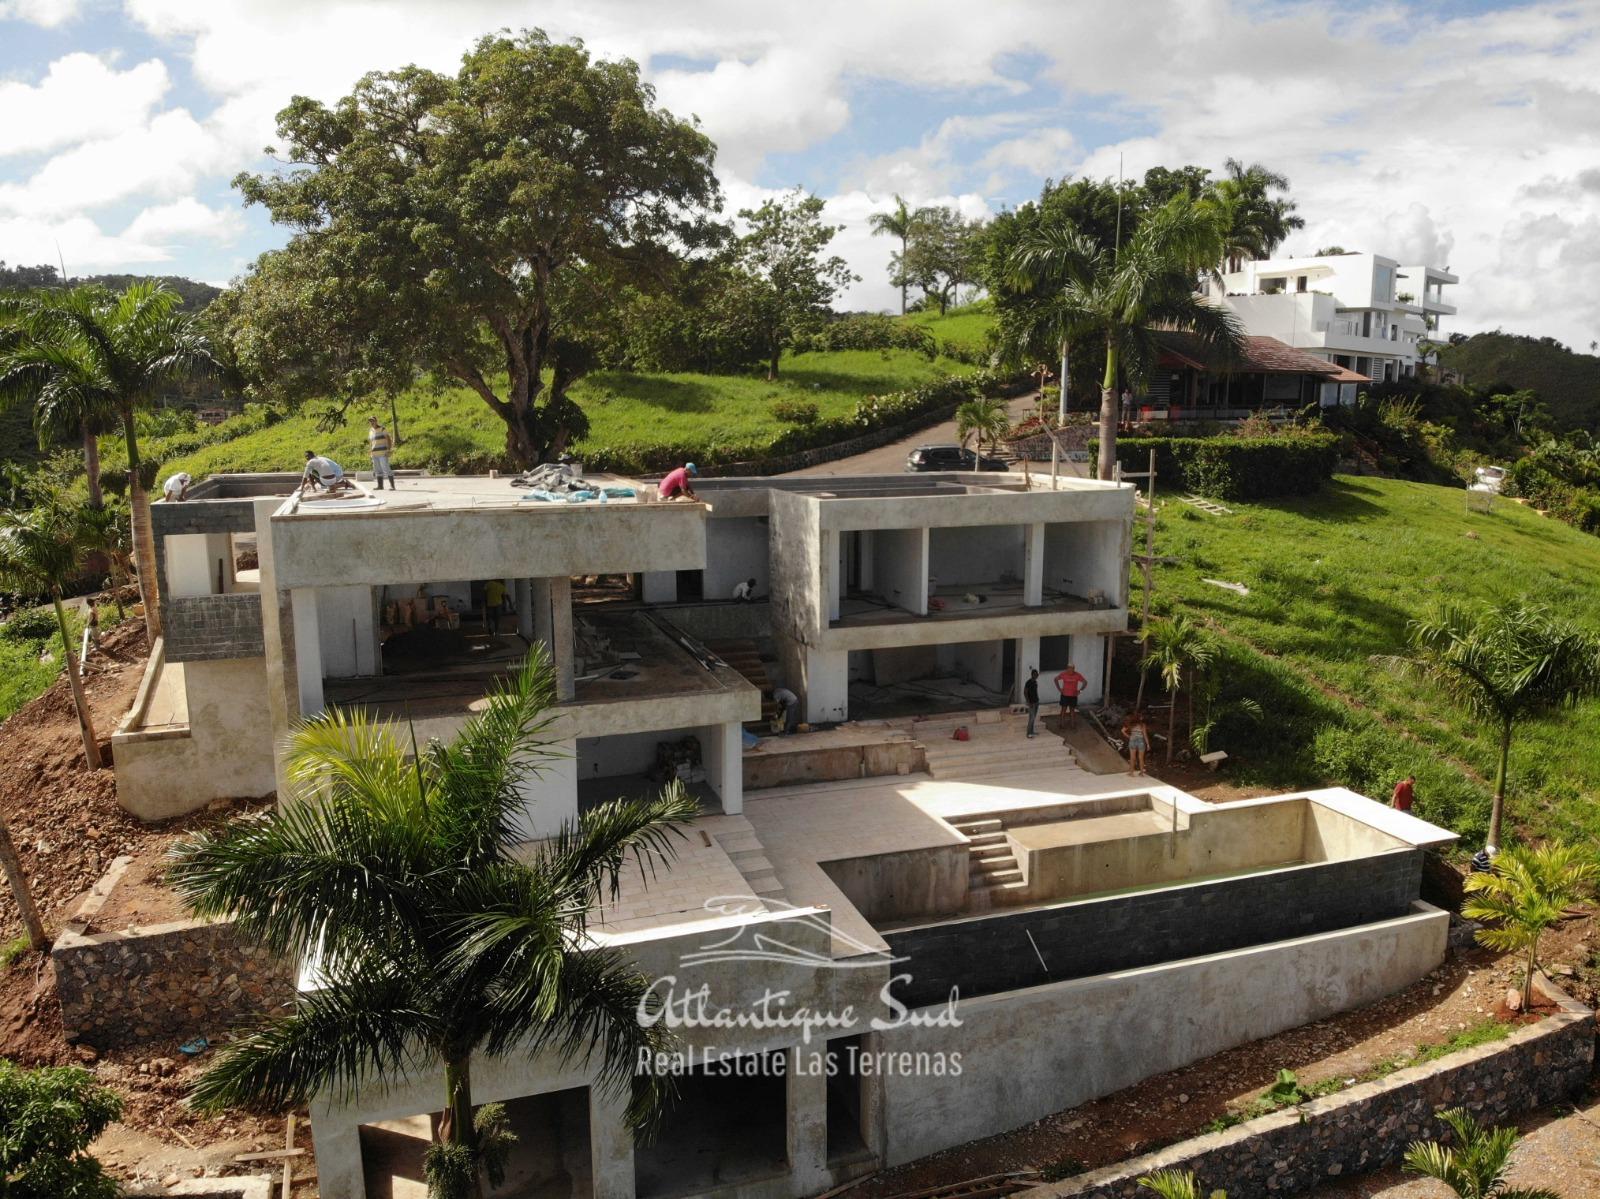 Hillside Lots for sale in Las Terrenas20.jpeg